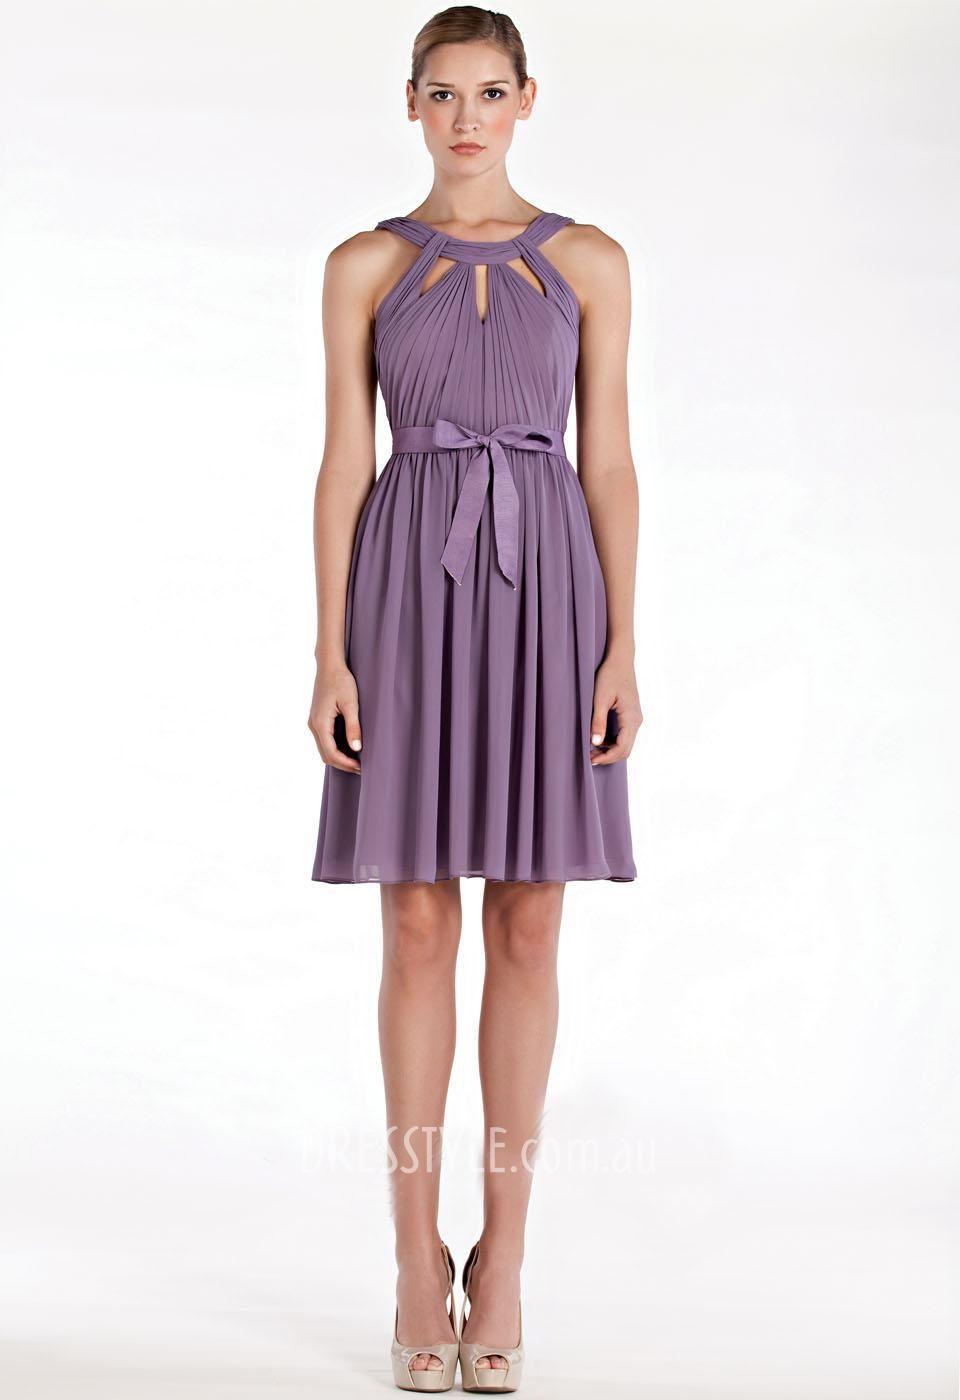 Purple dresses to wear to a wedding  purple halter sleeveless aline short above knee length formal